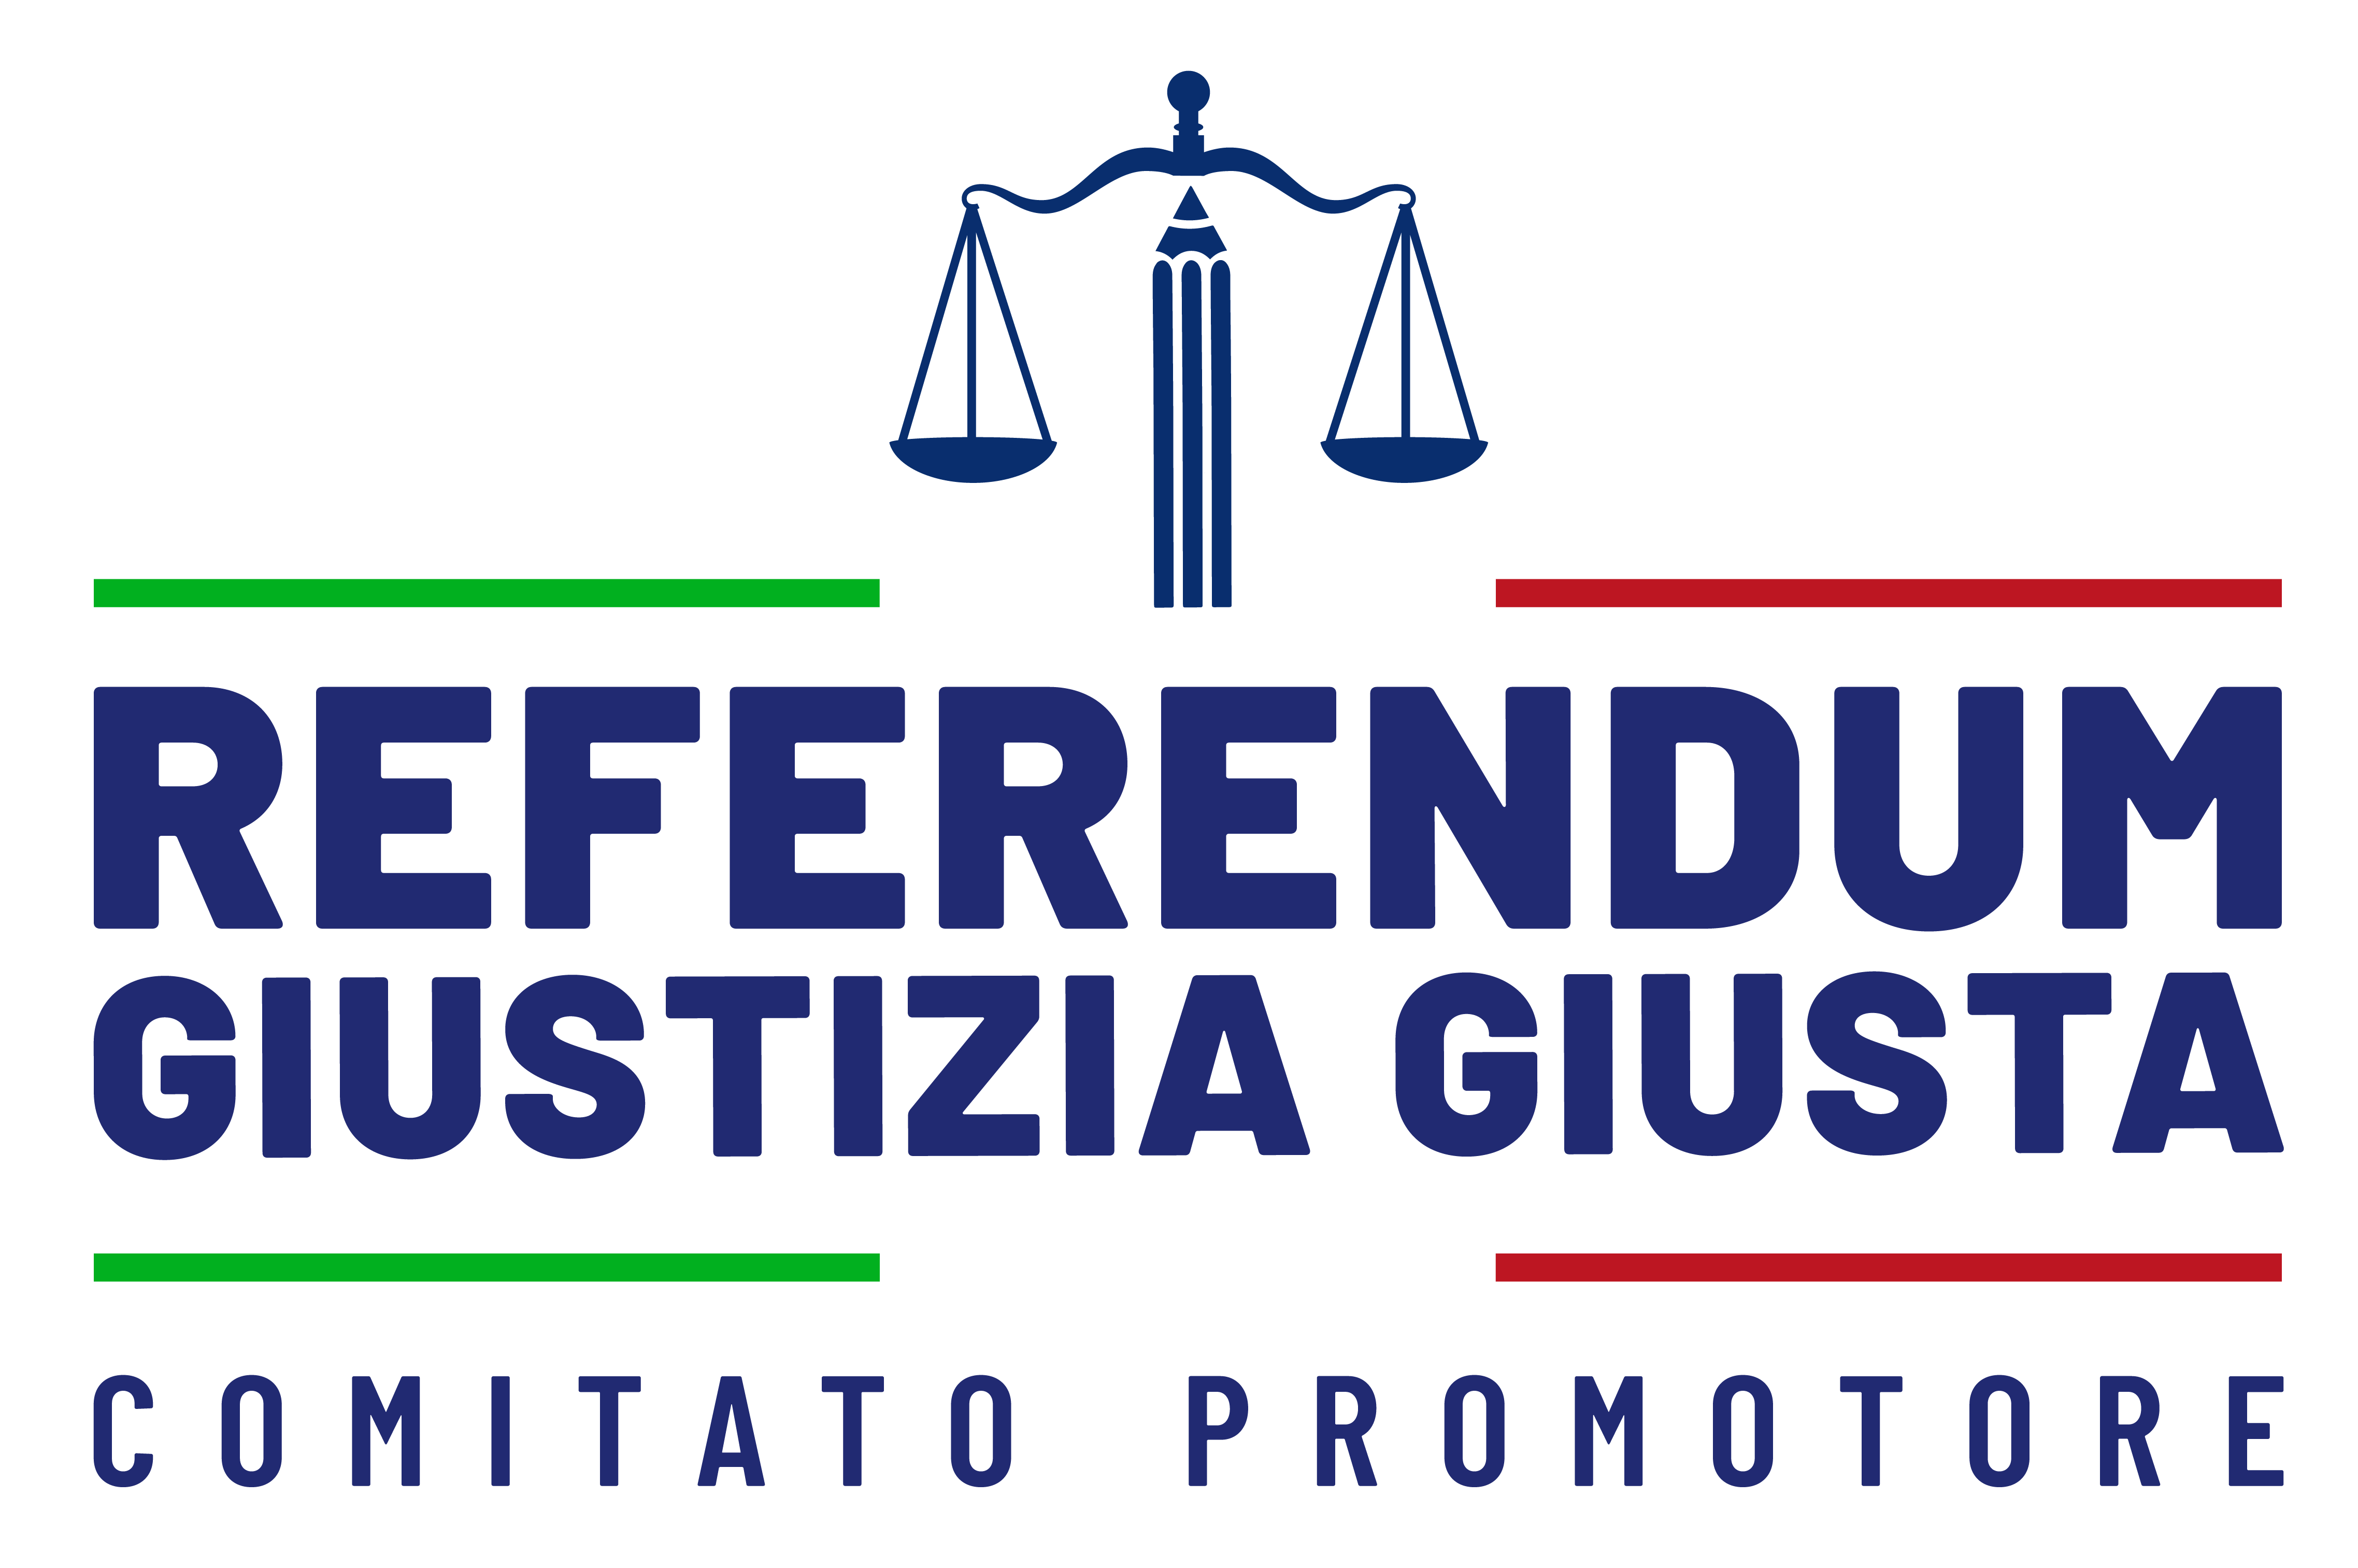 Logo Comitato promotore REFERENDUM GIUSTIZIA GIUSTA